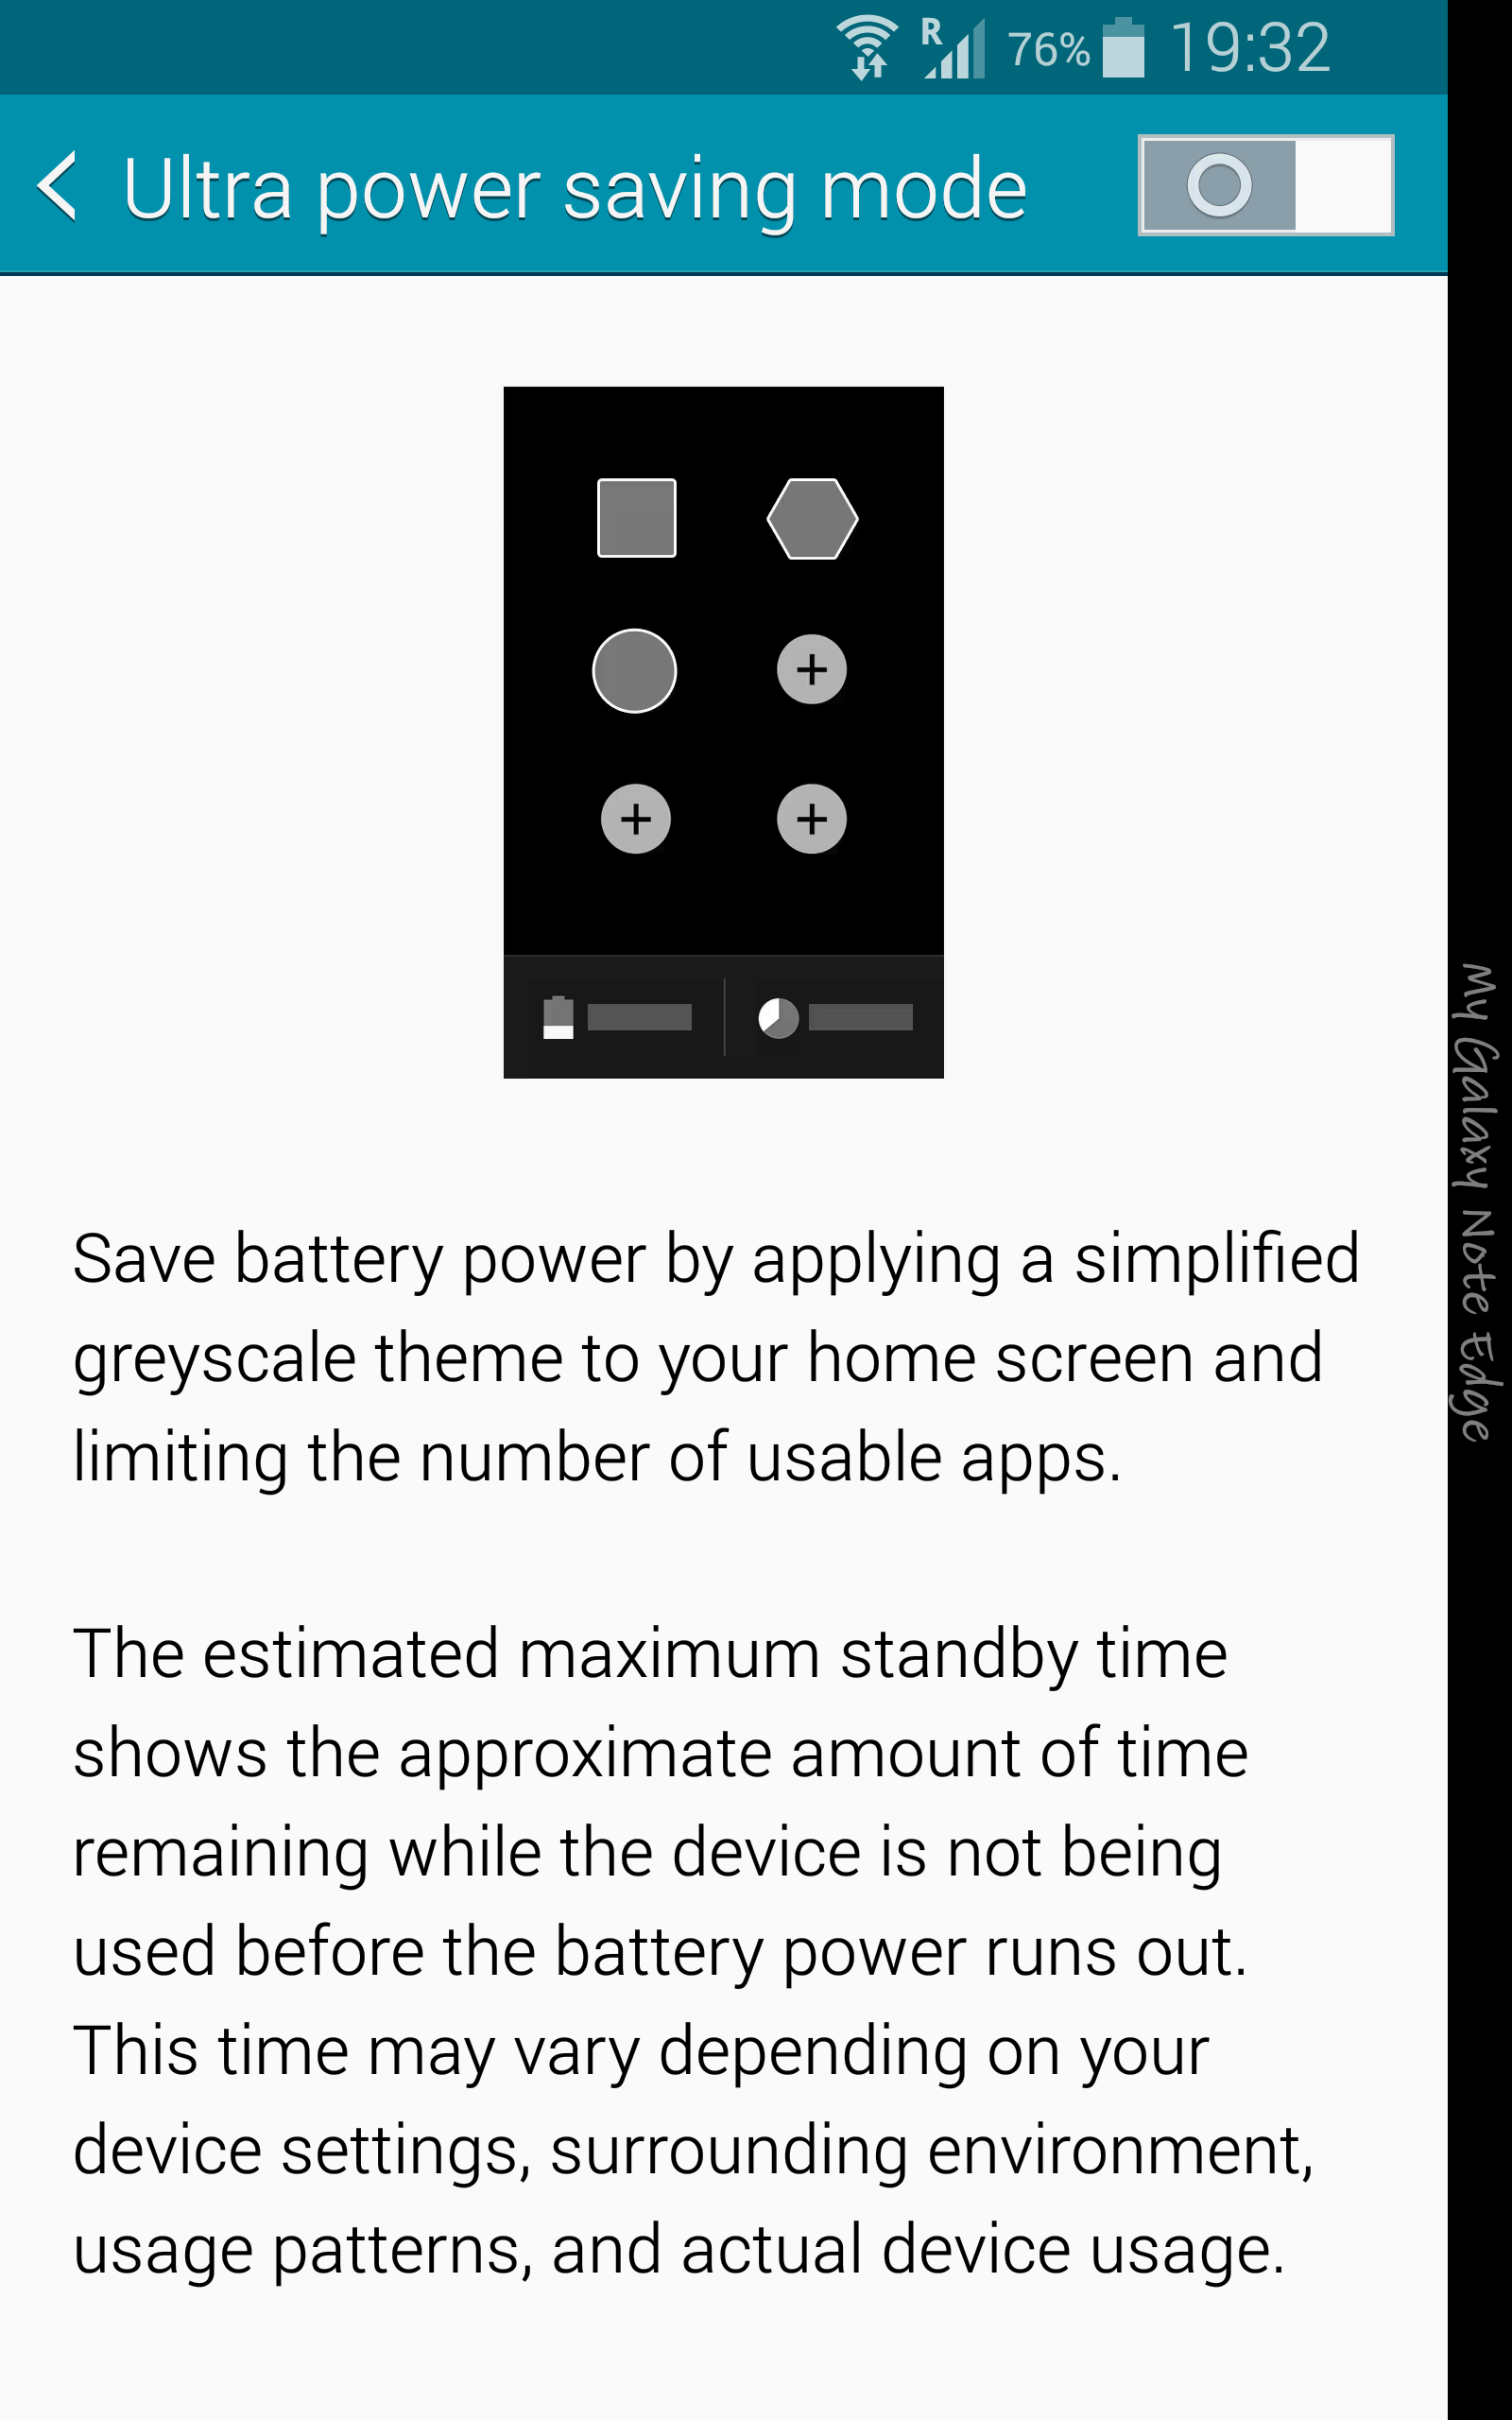 Samsung Galaxy Note Edge_power saving